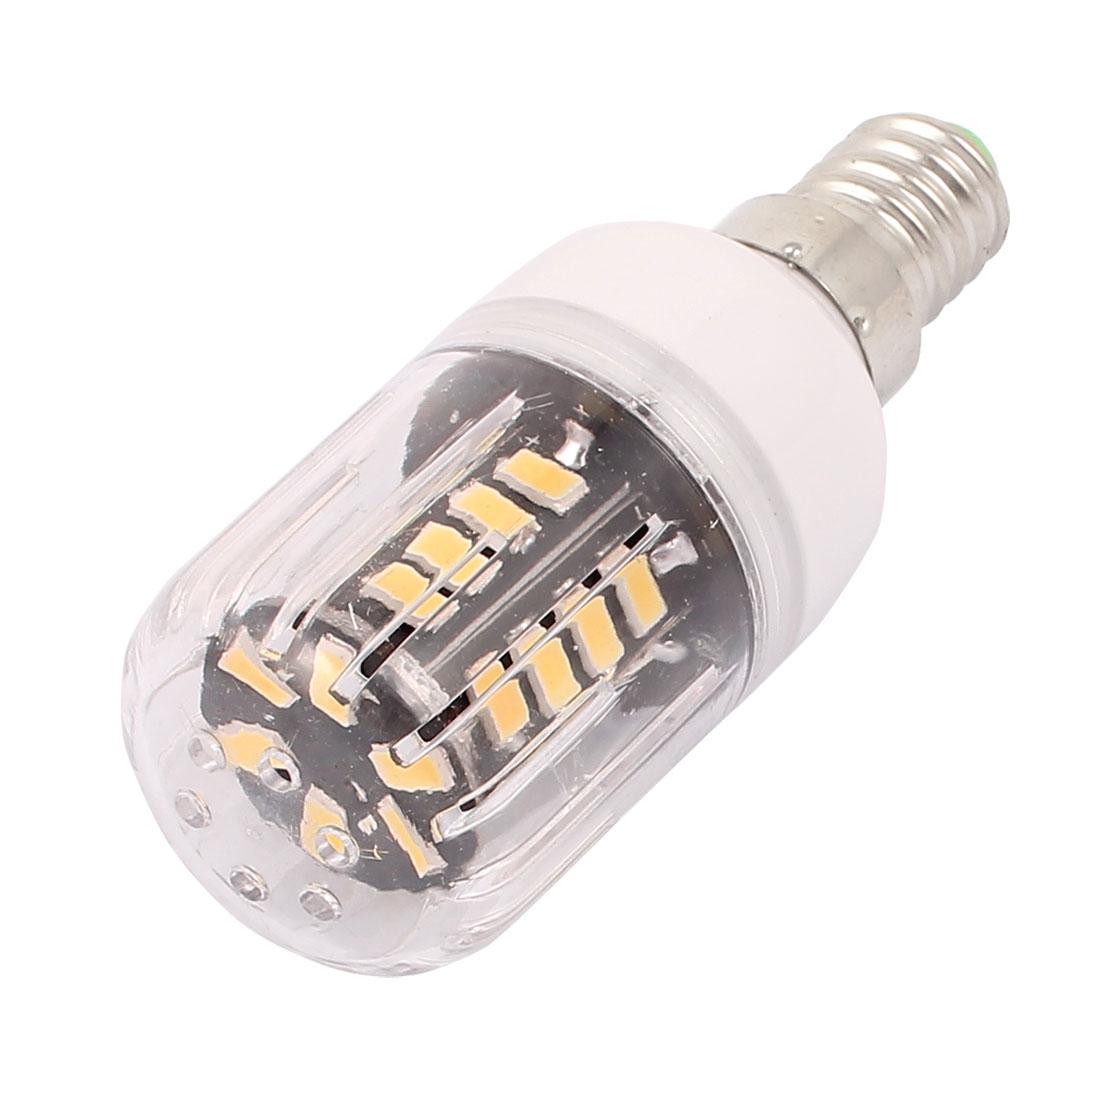 AC 220V New Super Bright E14 3W 30 LEDs 5733 SMD Energy Saving Corn Bulb Lamp Warm White